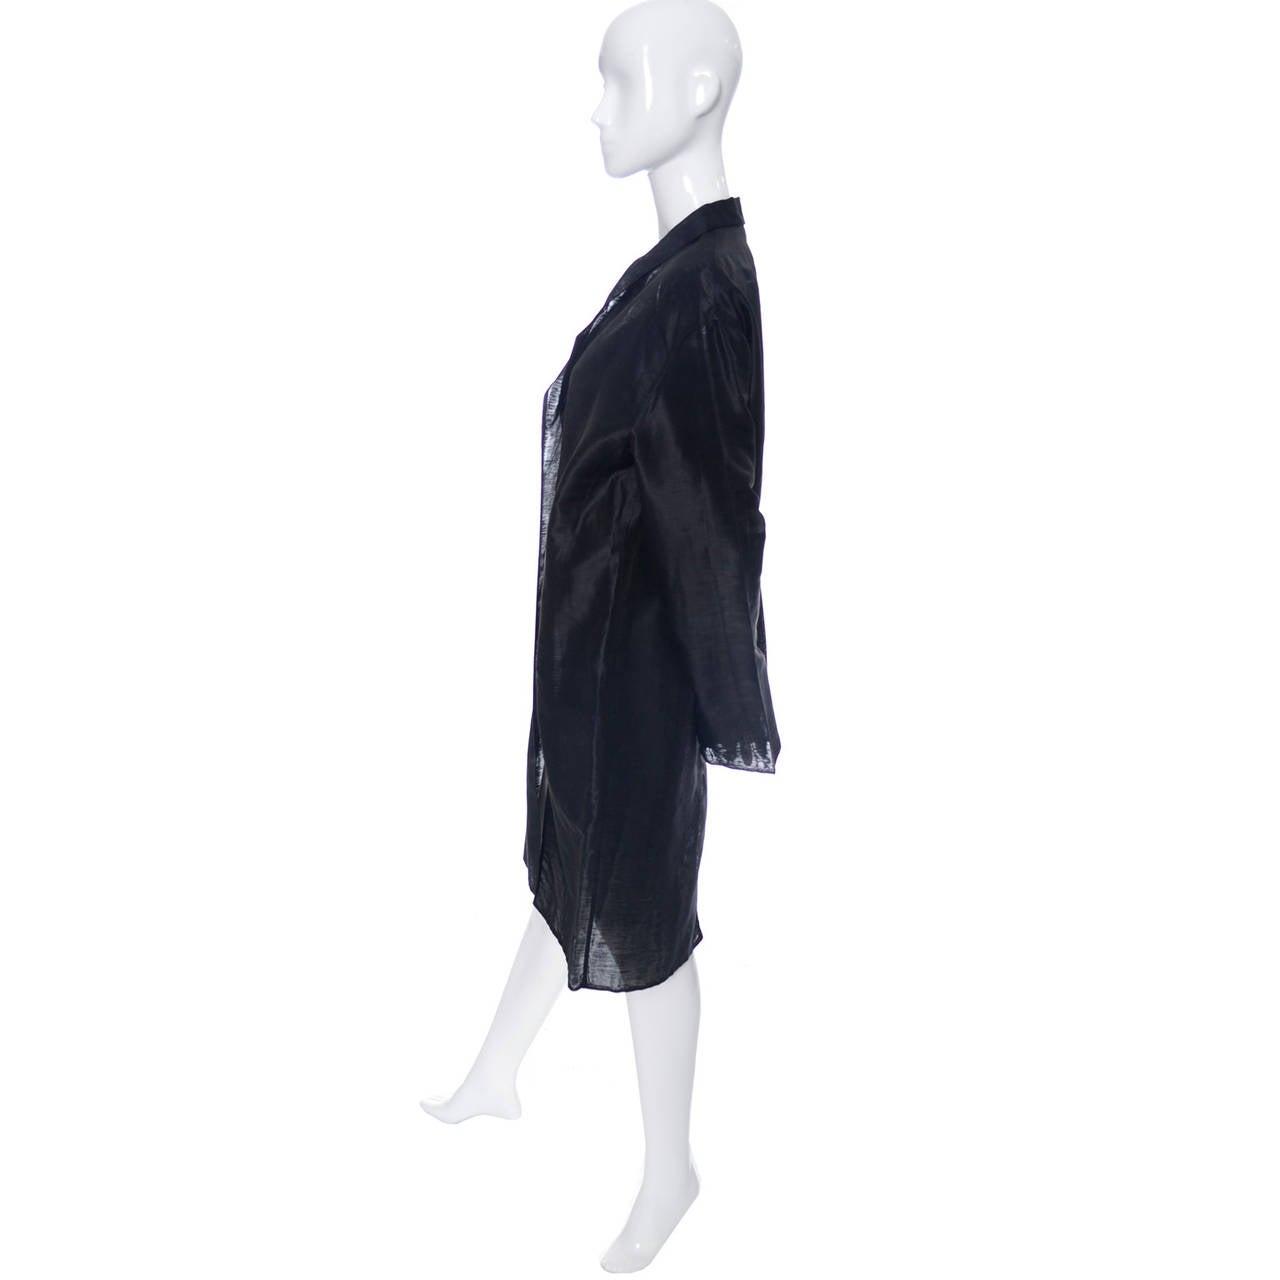 Donna Karan New York Black Label Linen Organza Evening Coat Semi Sheer 1